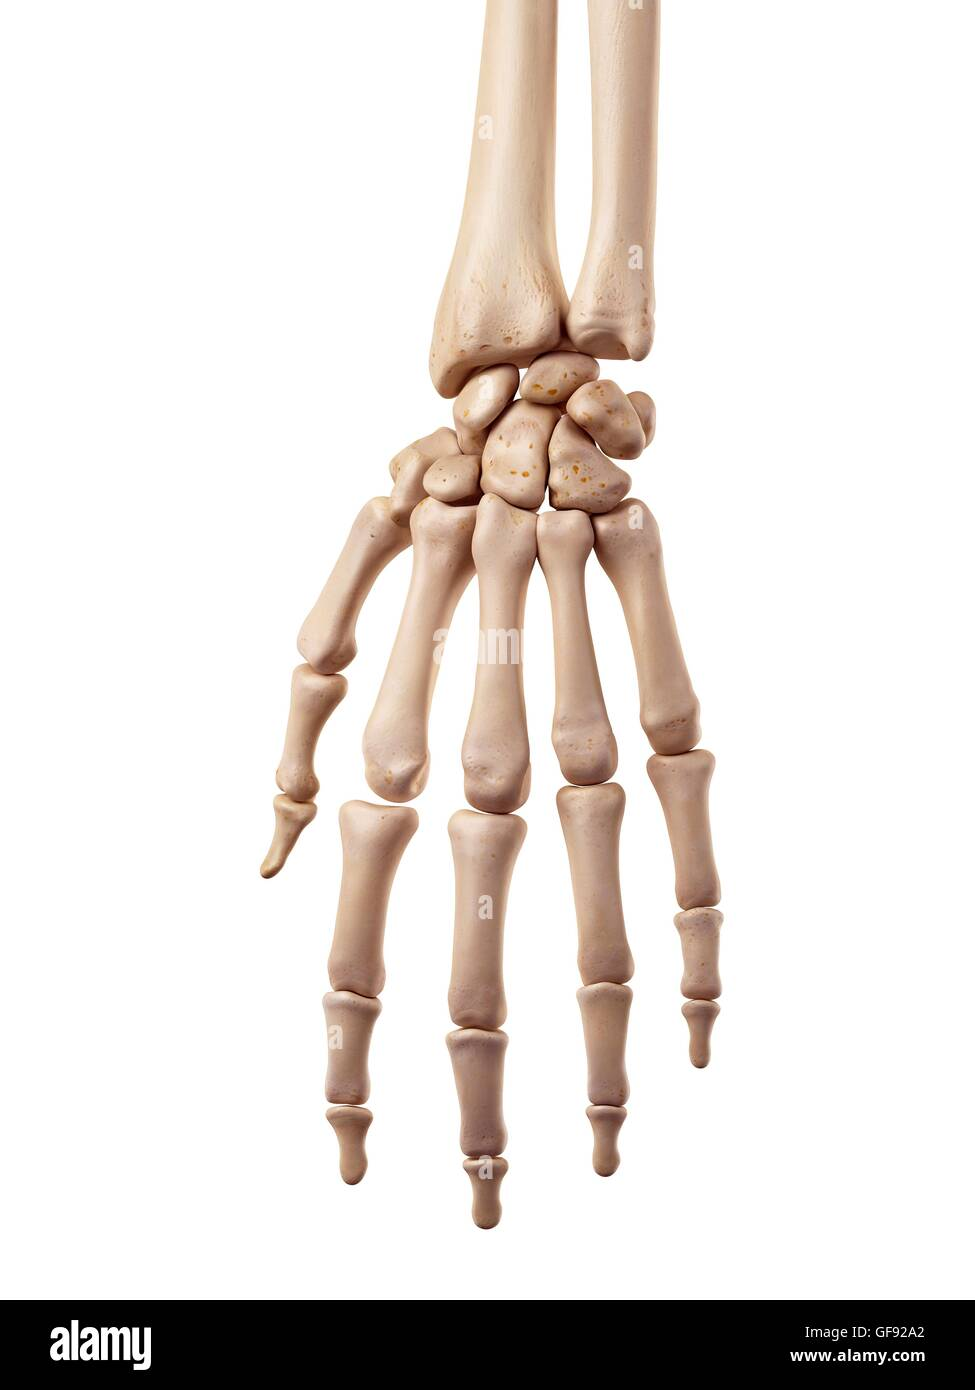 Human hand bones, illustration Stock Photo: 112681466 - Alamy